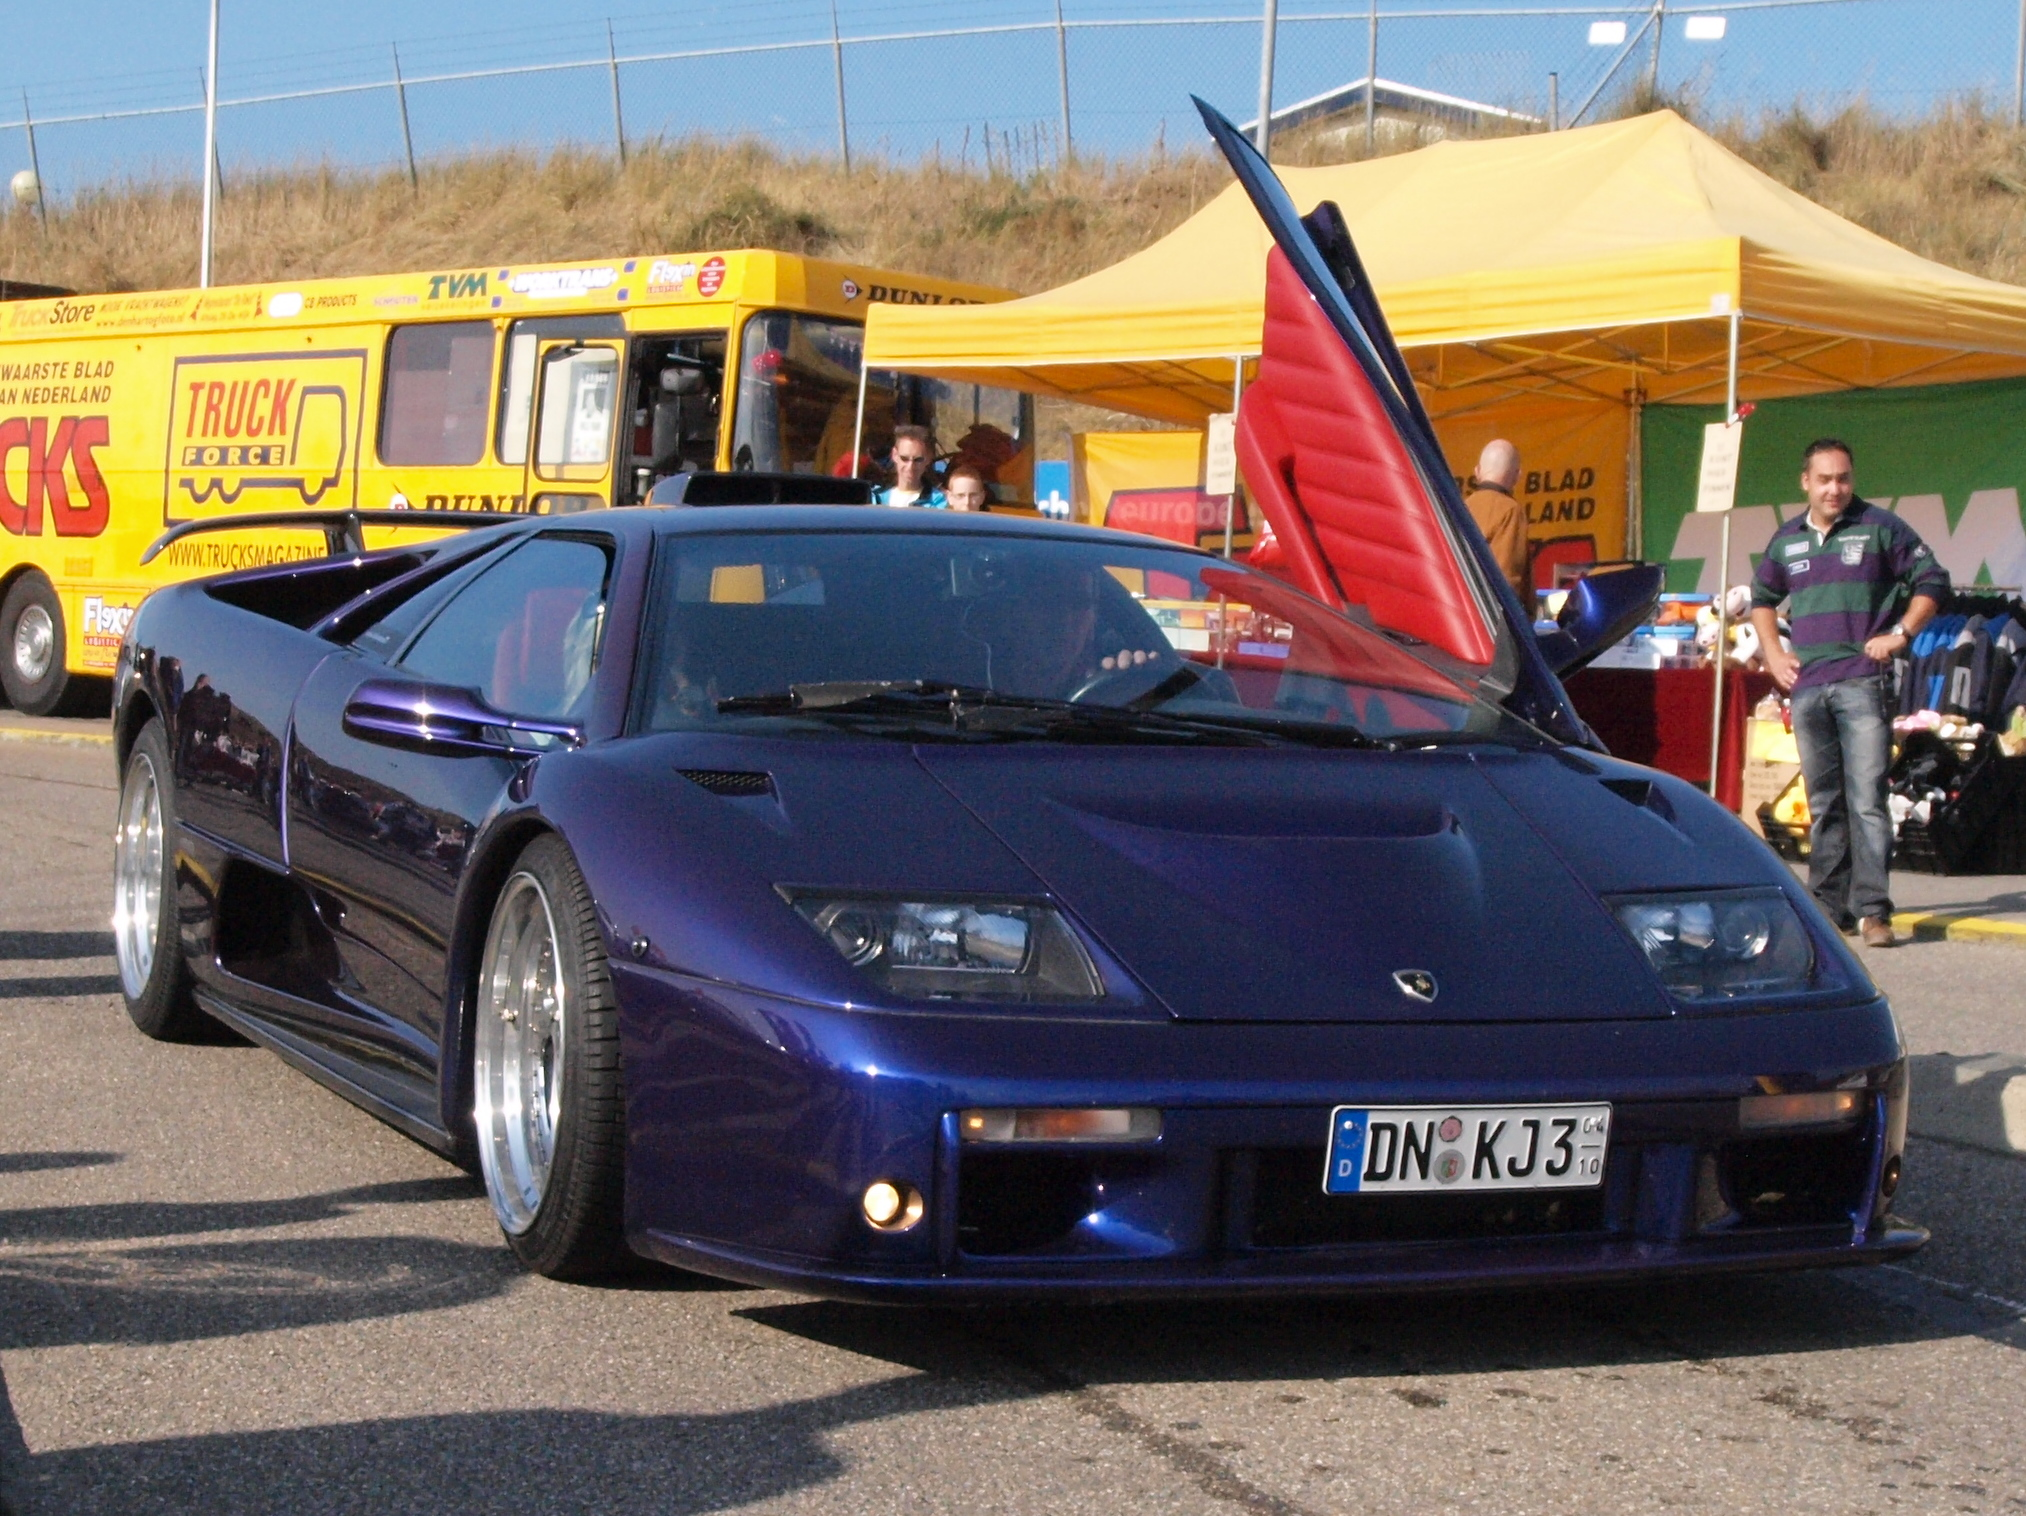 File2000 Lamborghini Diablo GT German Registration DN